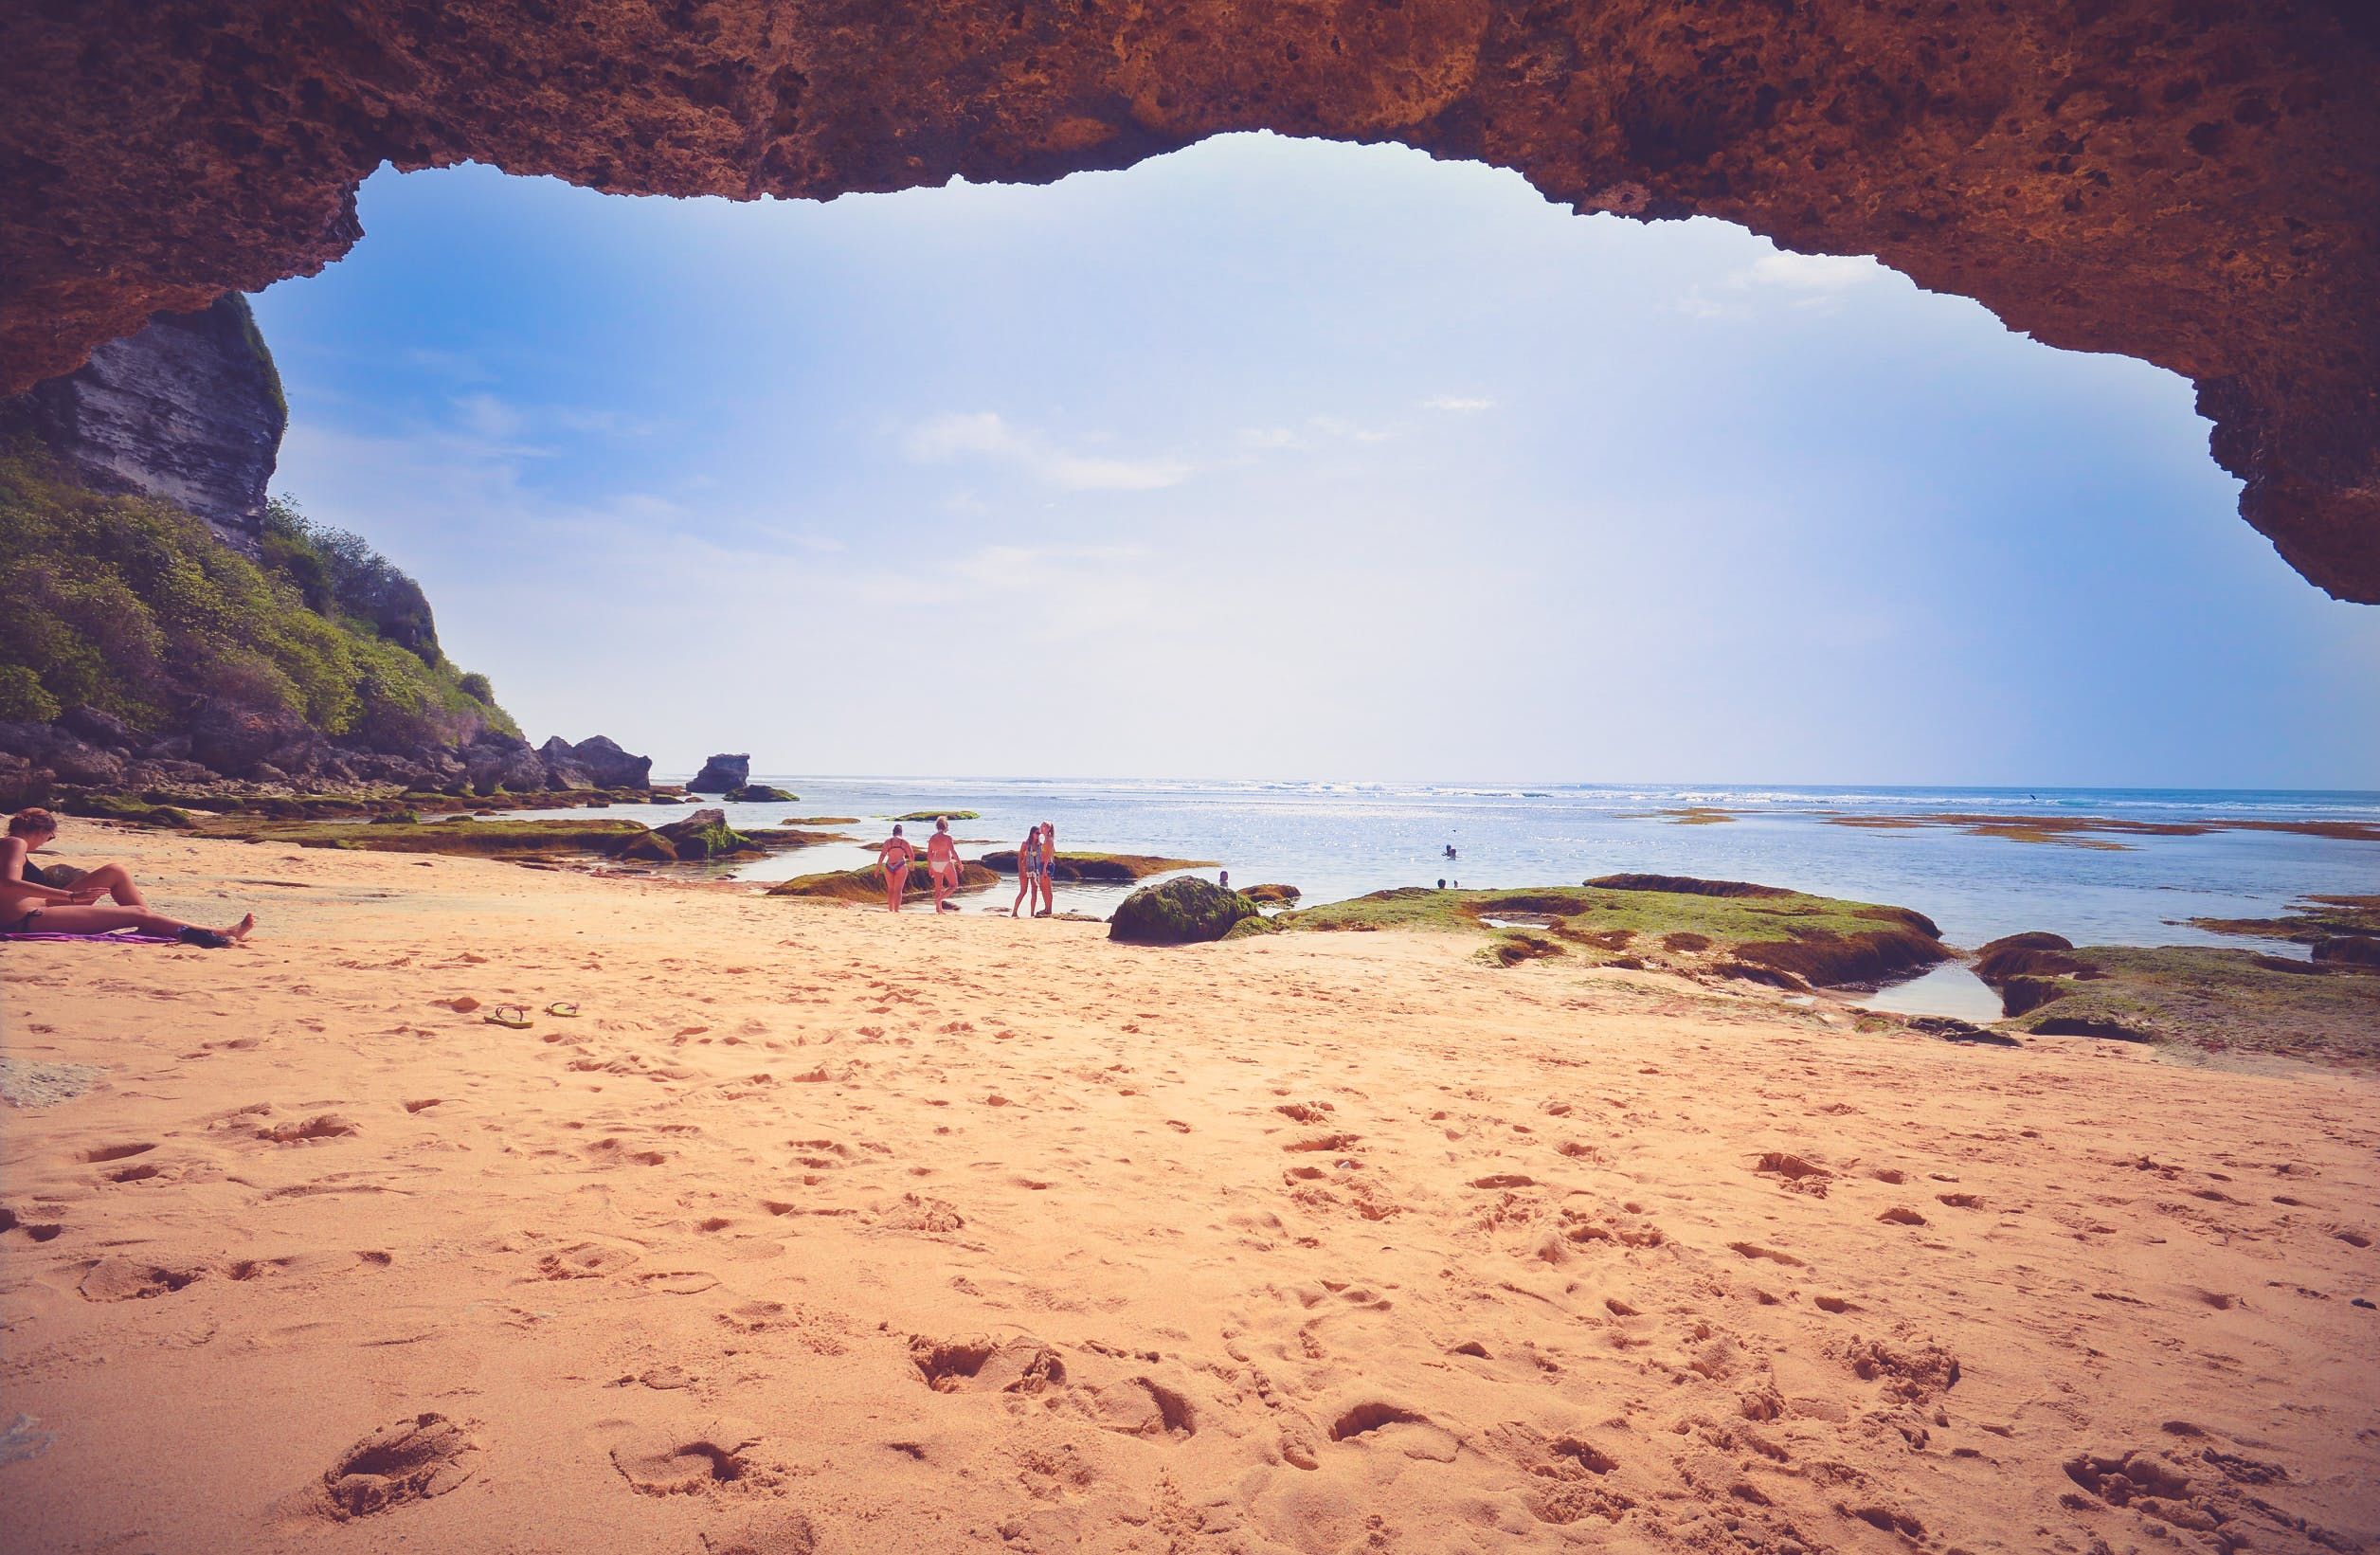 Free stock photo of beach, landscape, ocean, sand